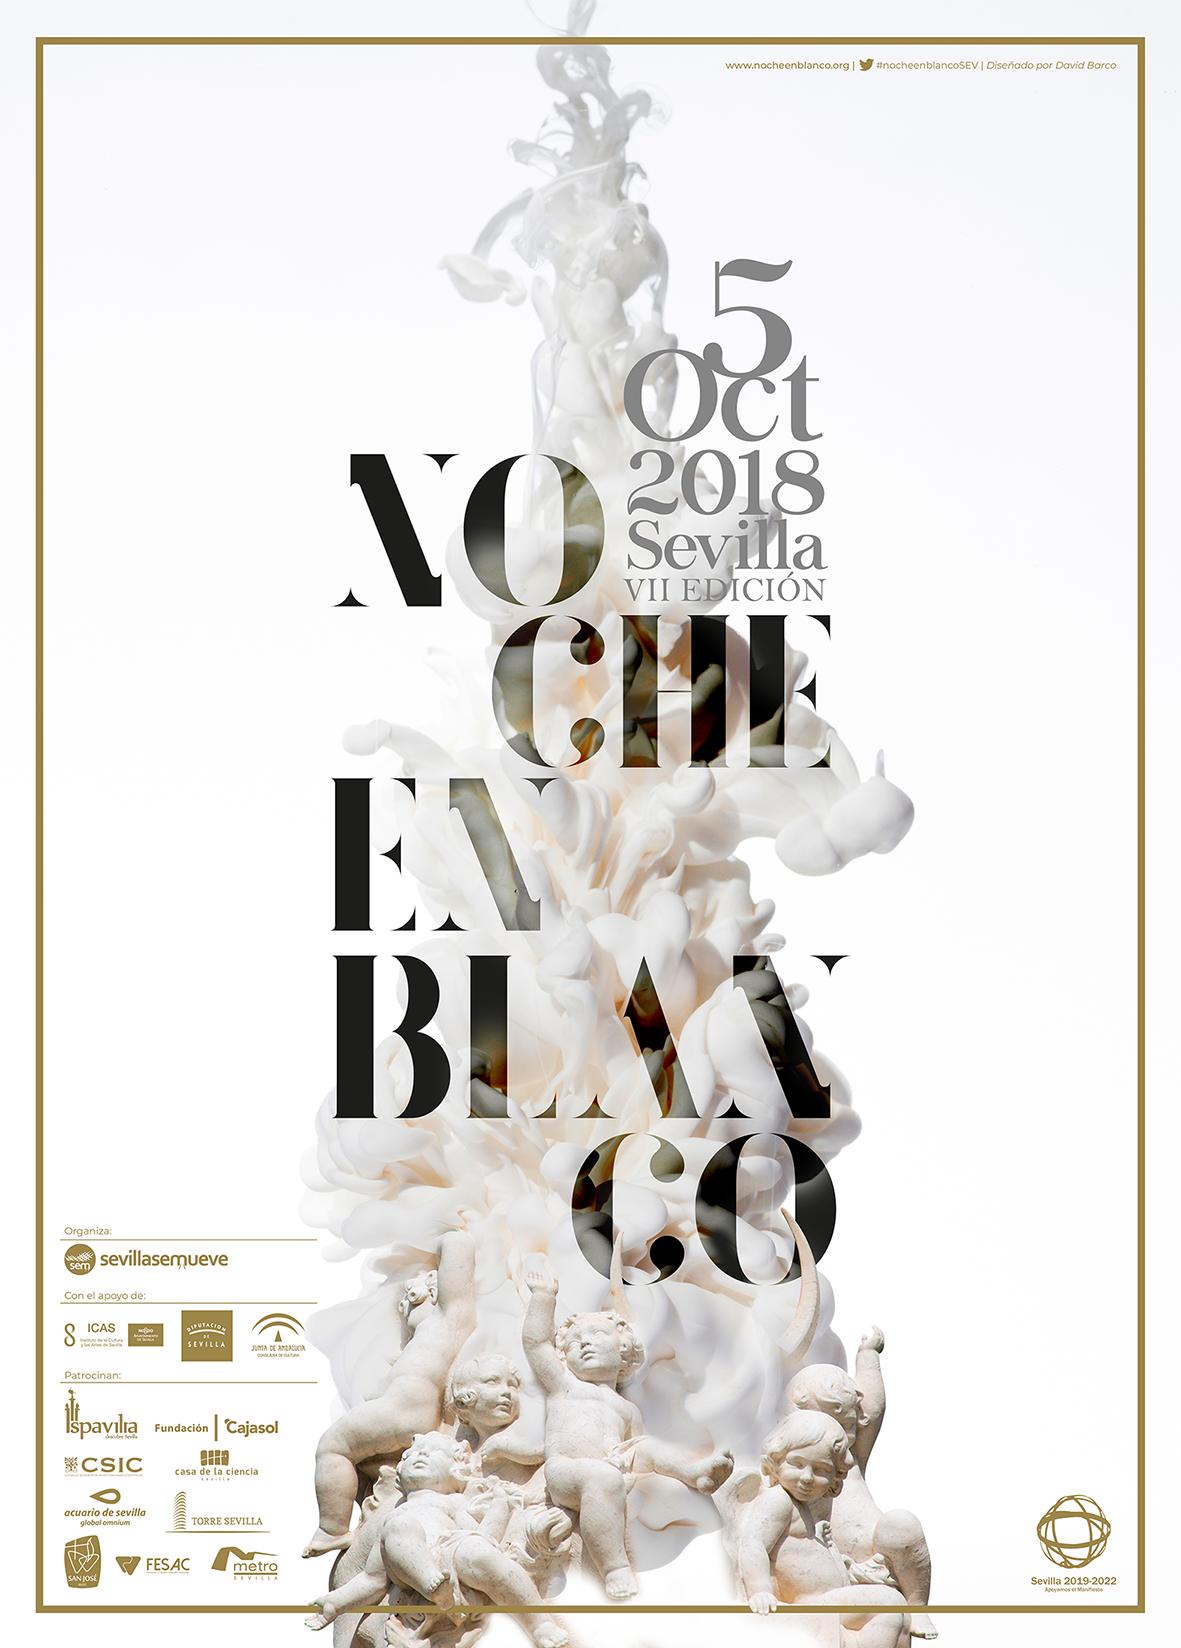 Noche en Blnaco 2018